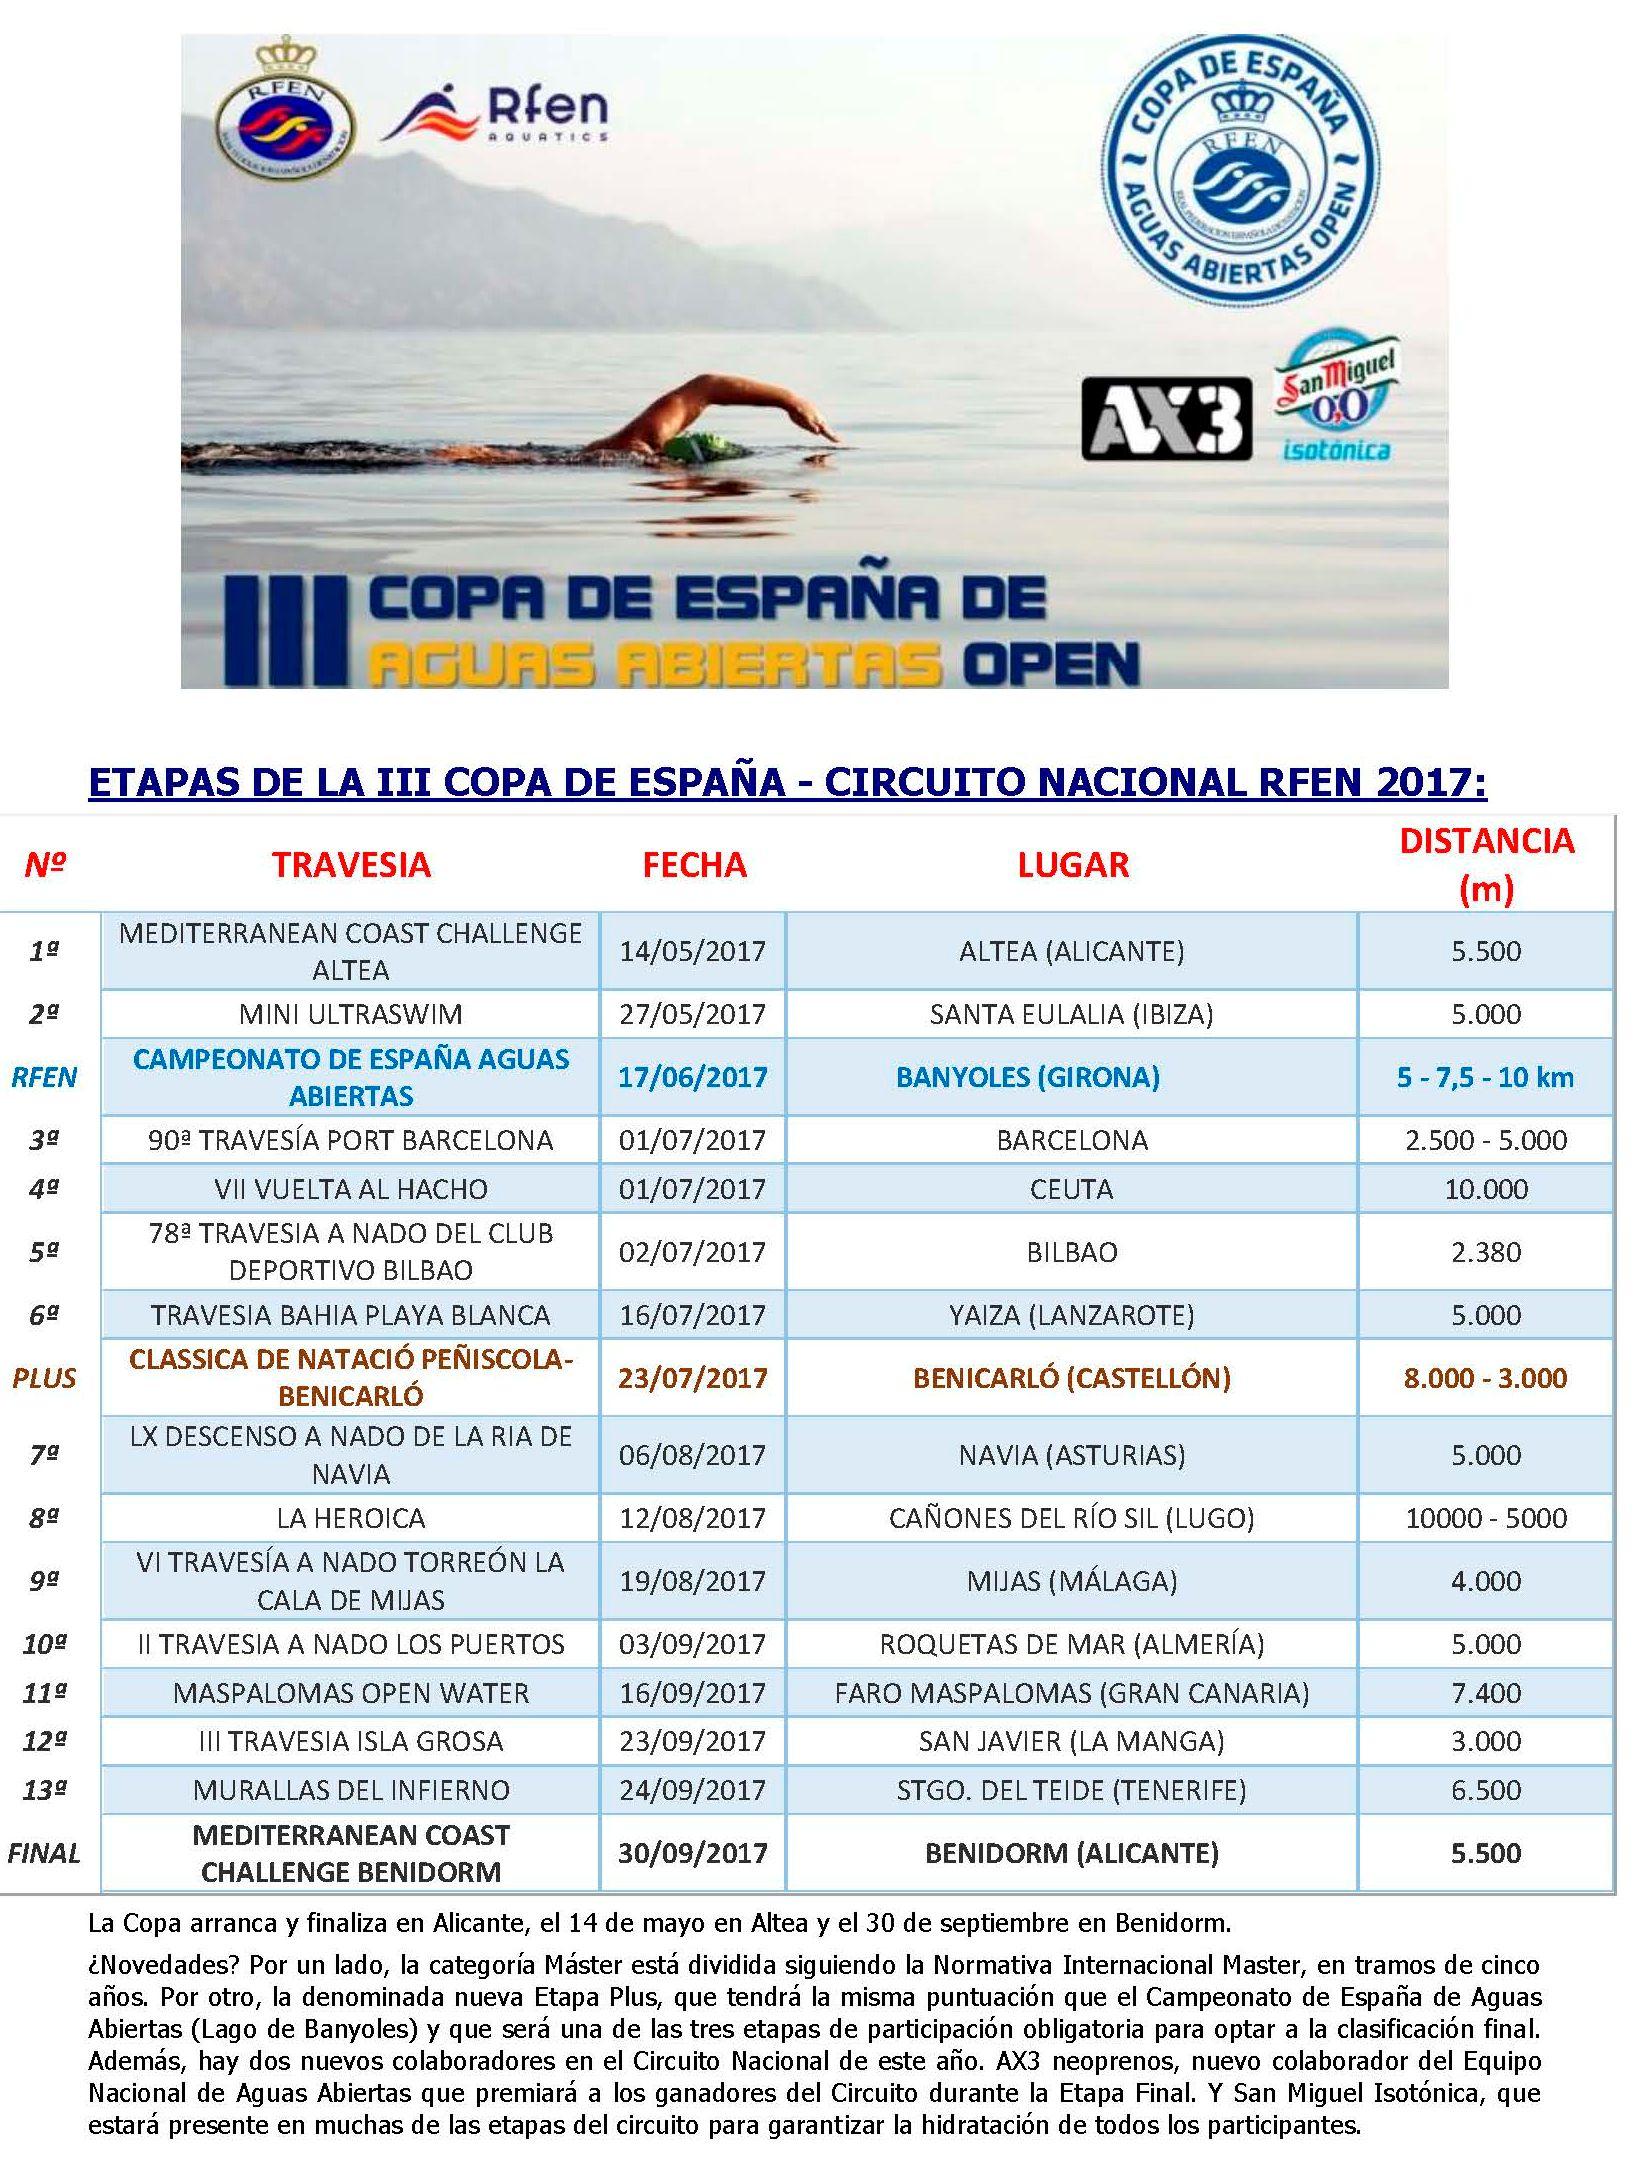 III COPA DE ESPAÑA de Aguas Abiertas 2016 - 2017